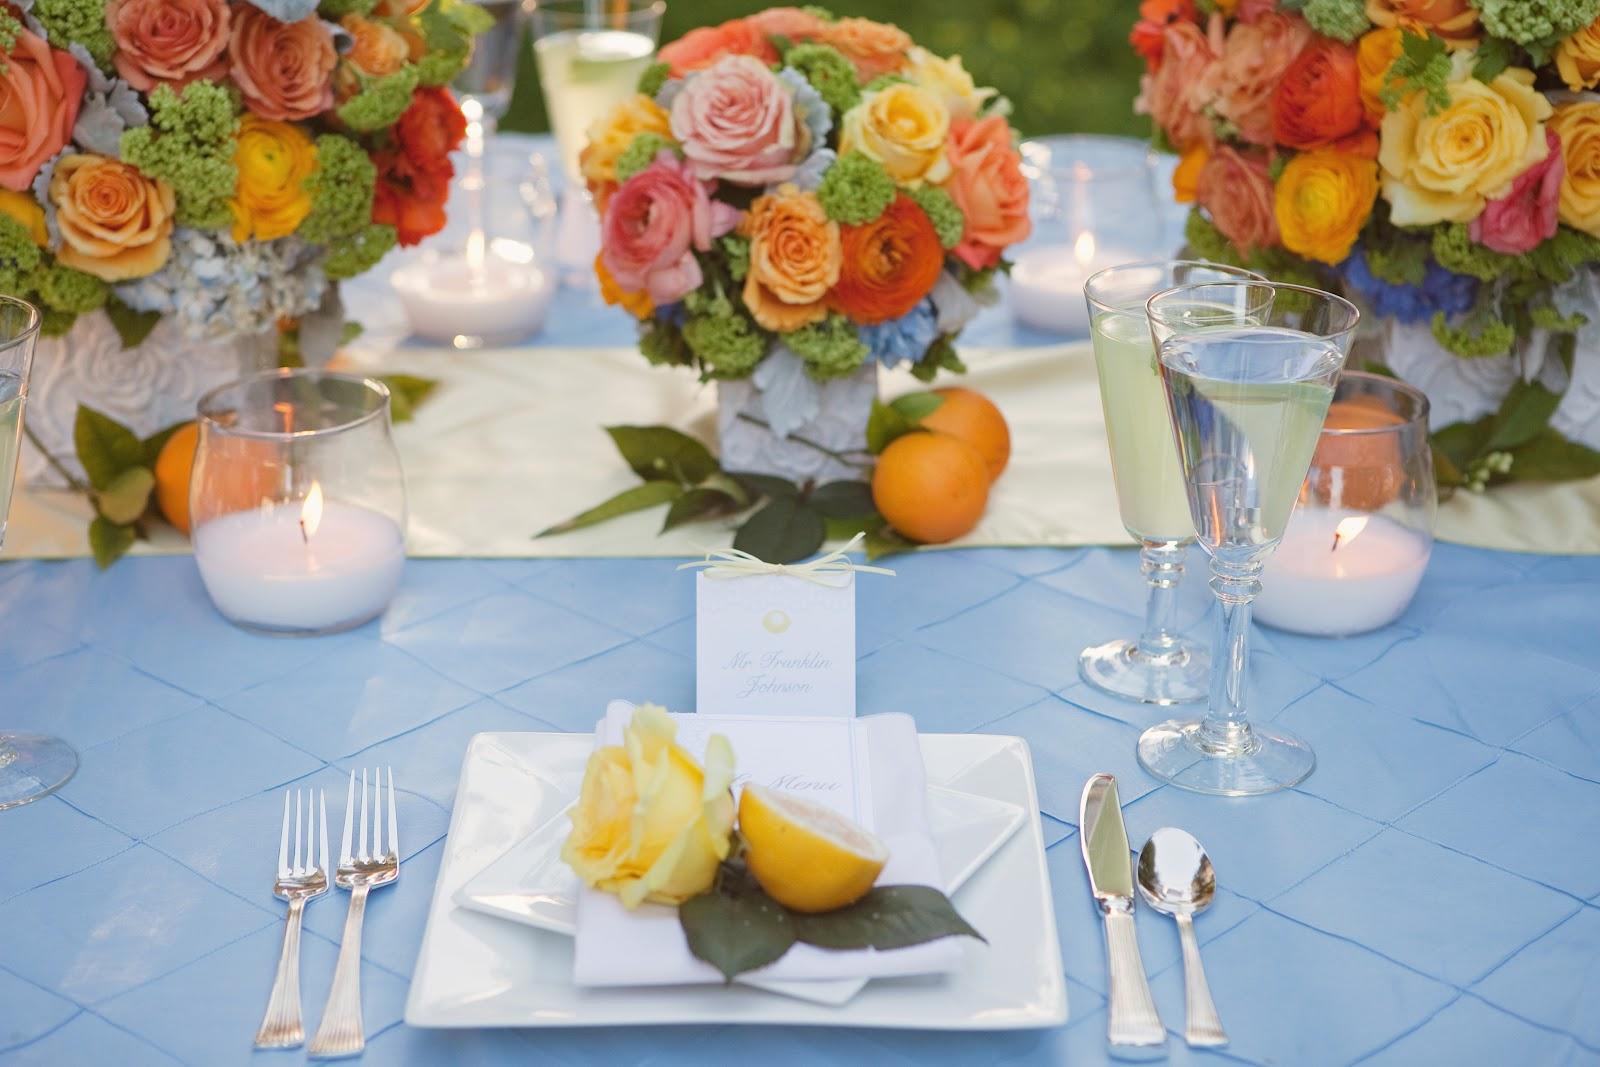 Orchard Wedding - Citrus Wedding Colors | Heavenly Blooms